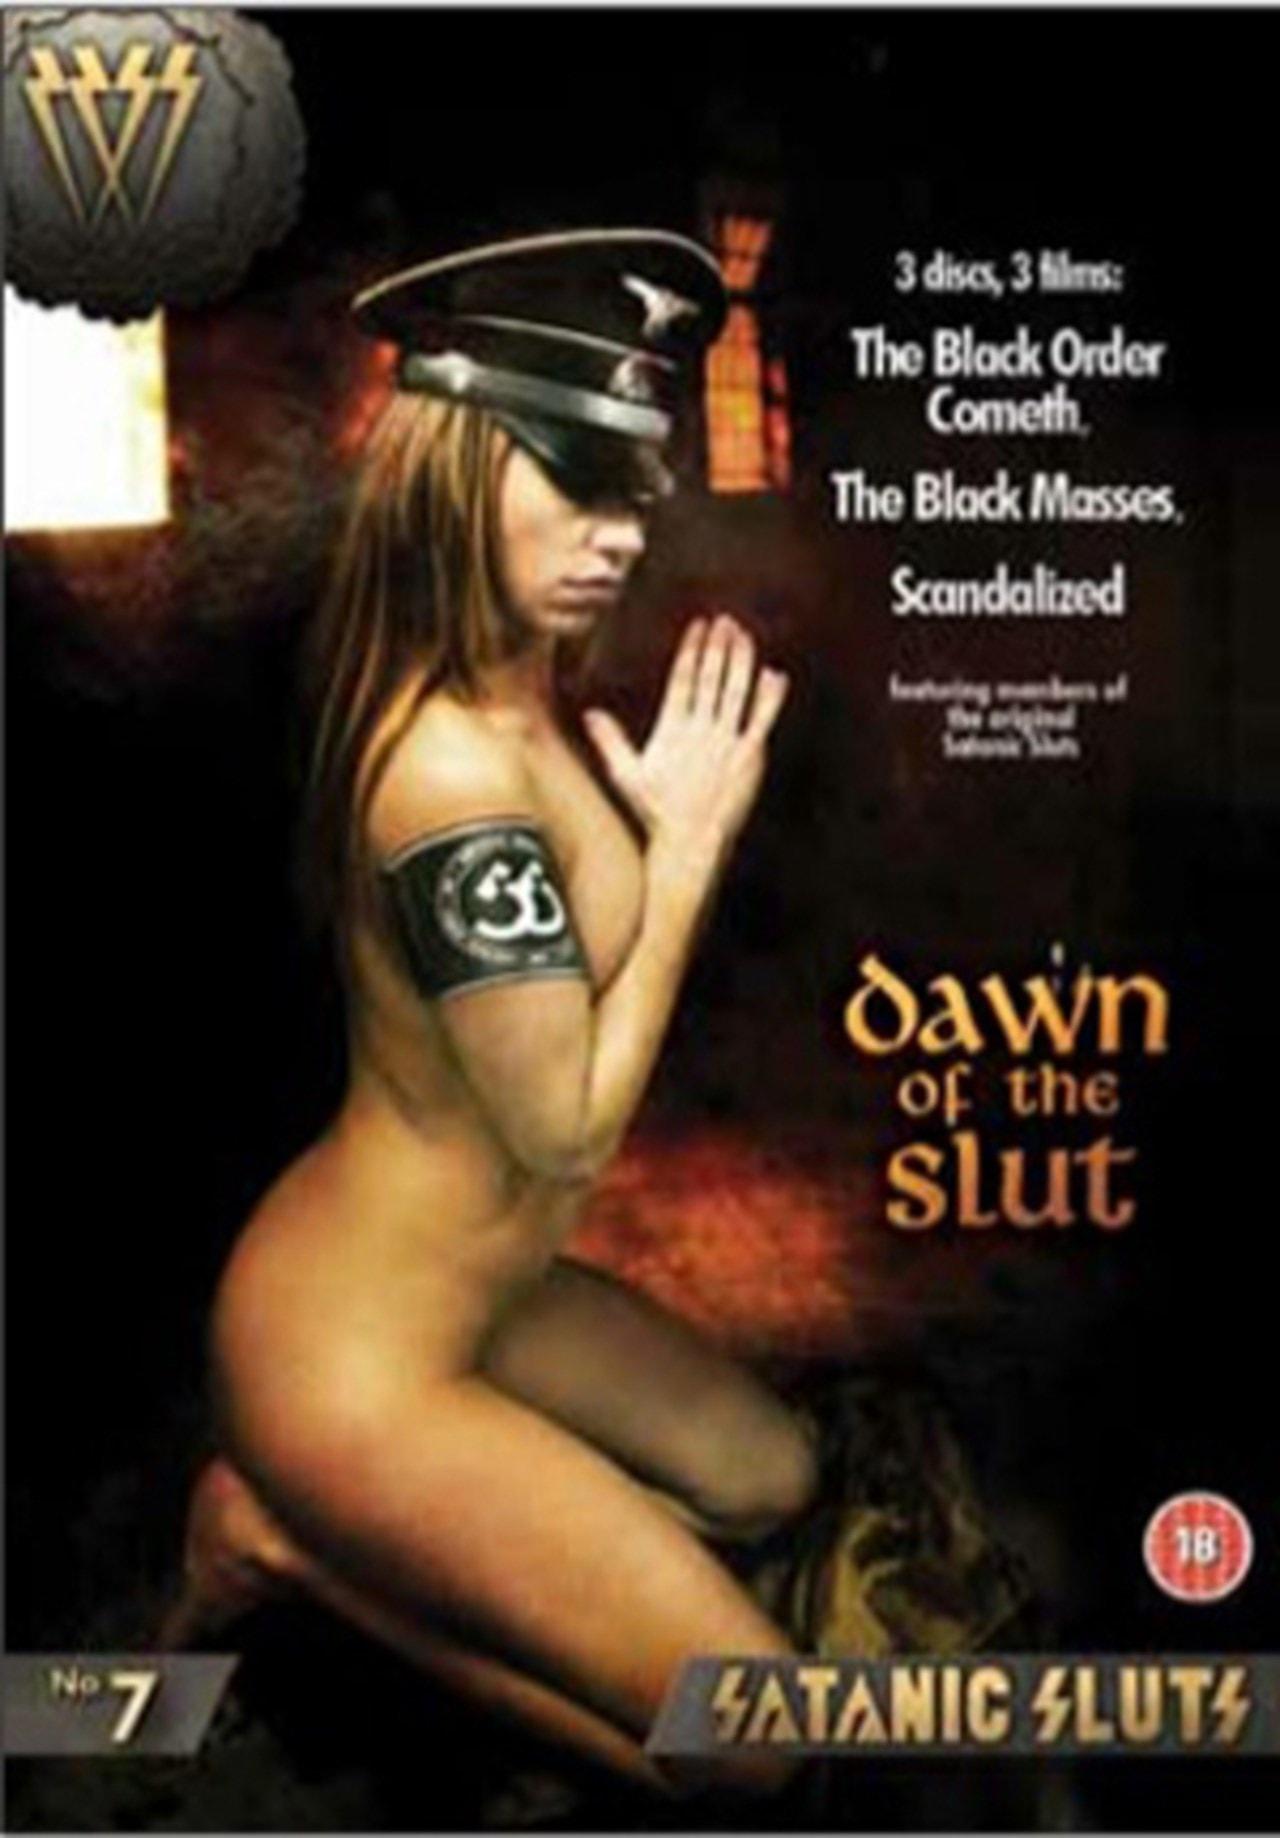 Satanic Sluts 7 - Dawn of the Slut - 1